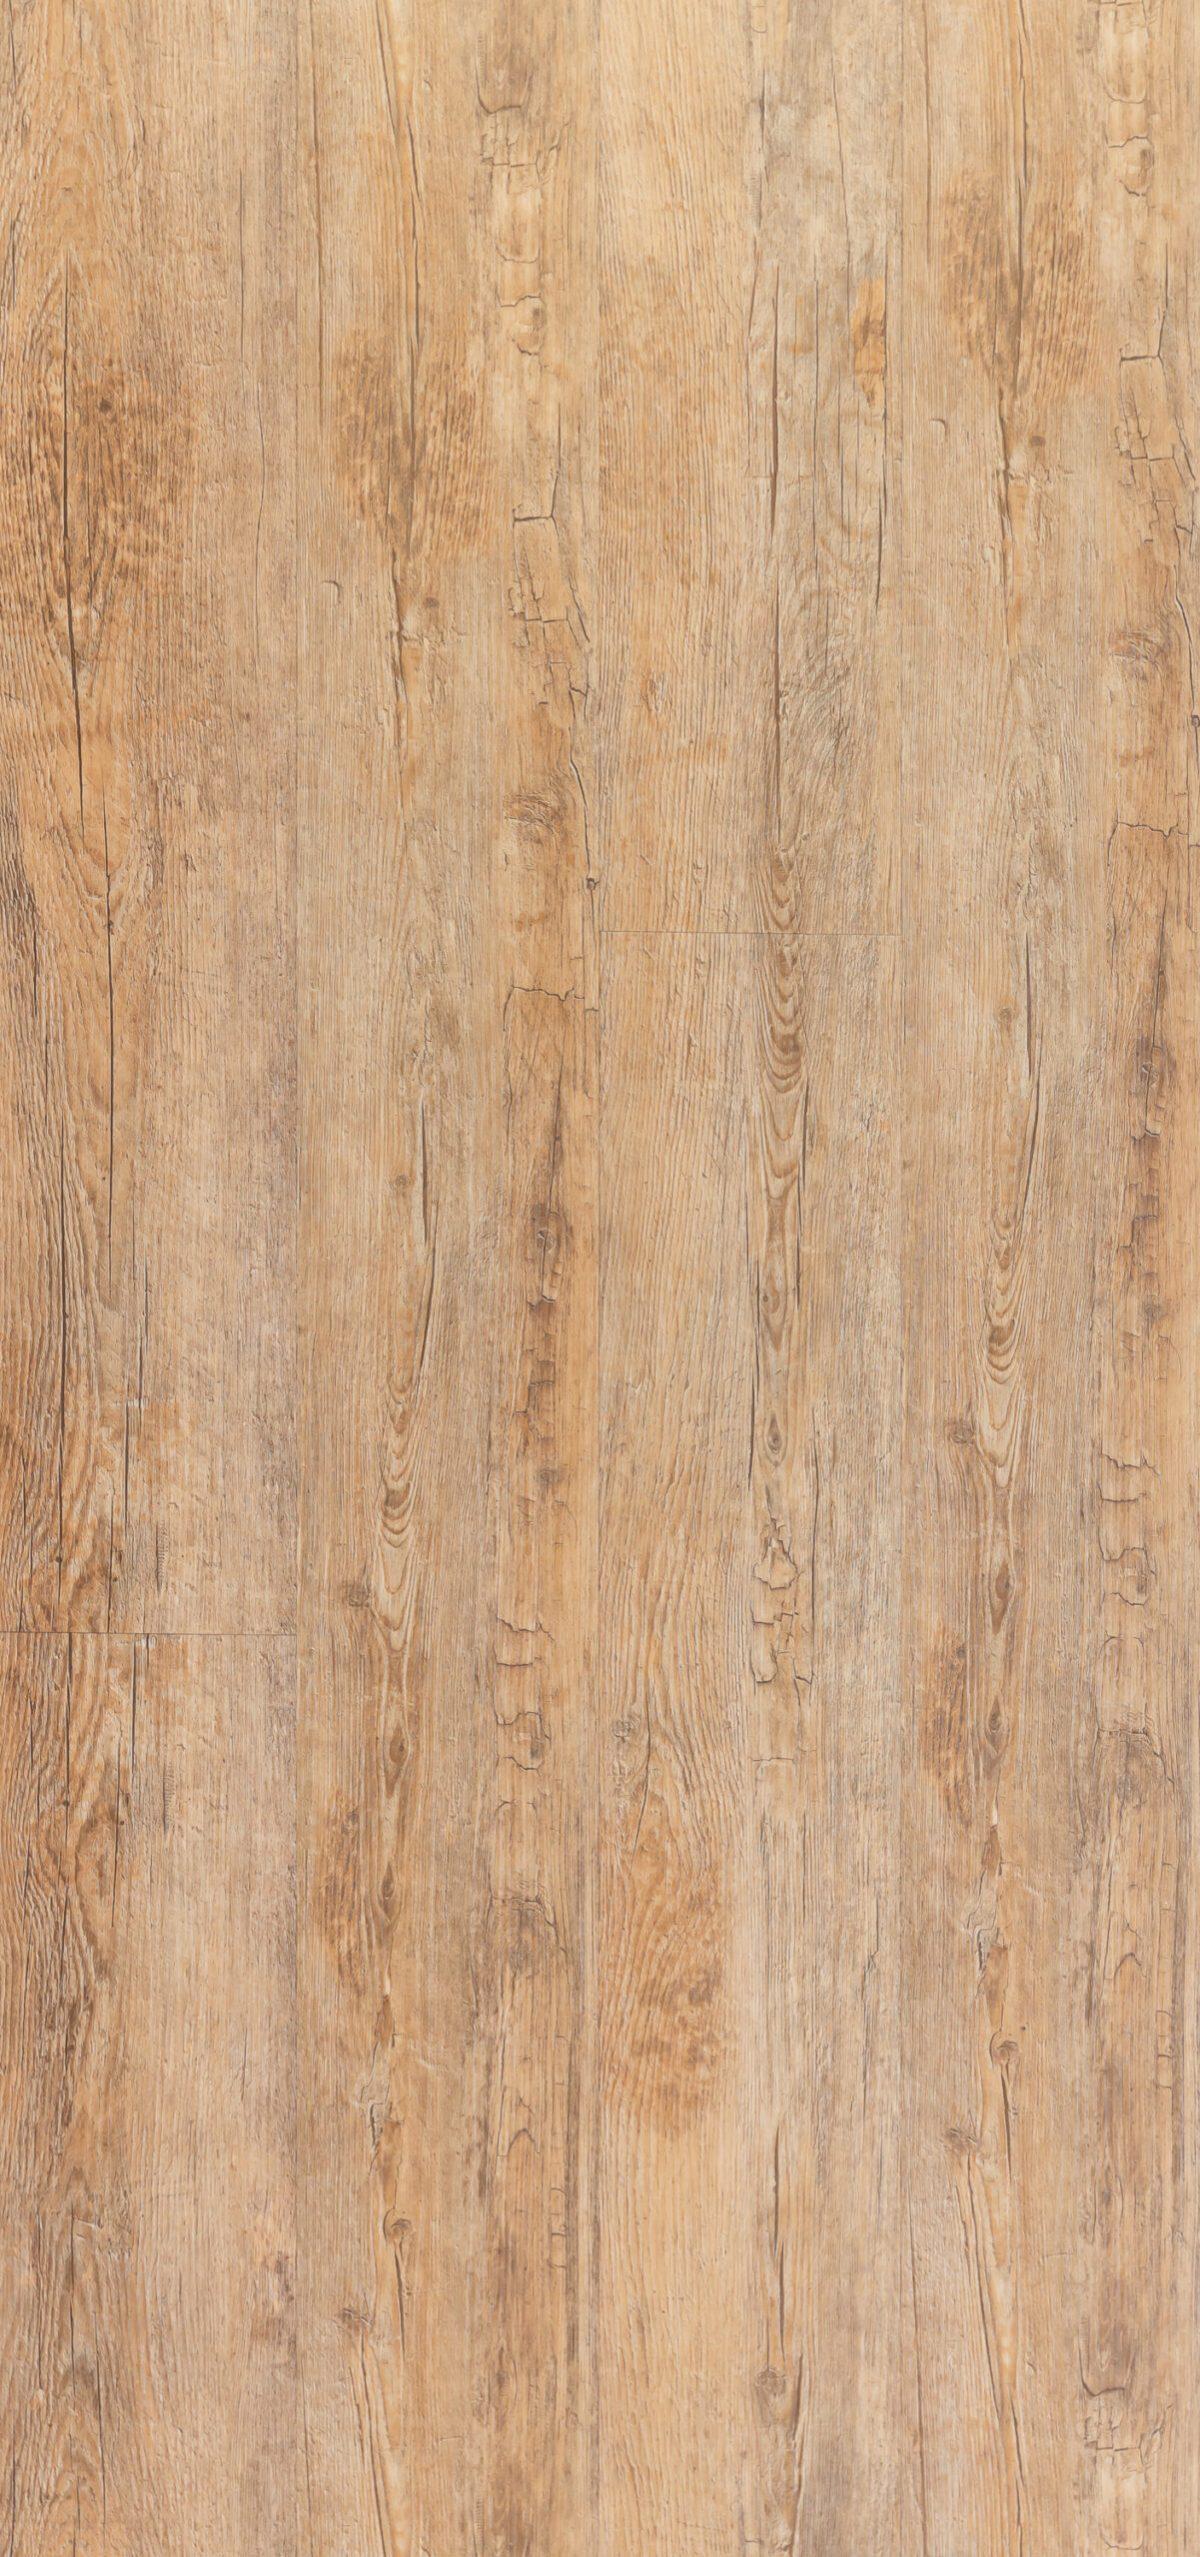 OAS802 Oakdale Long Plank Image